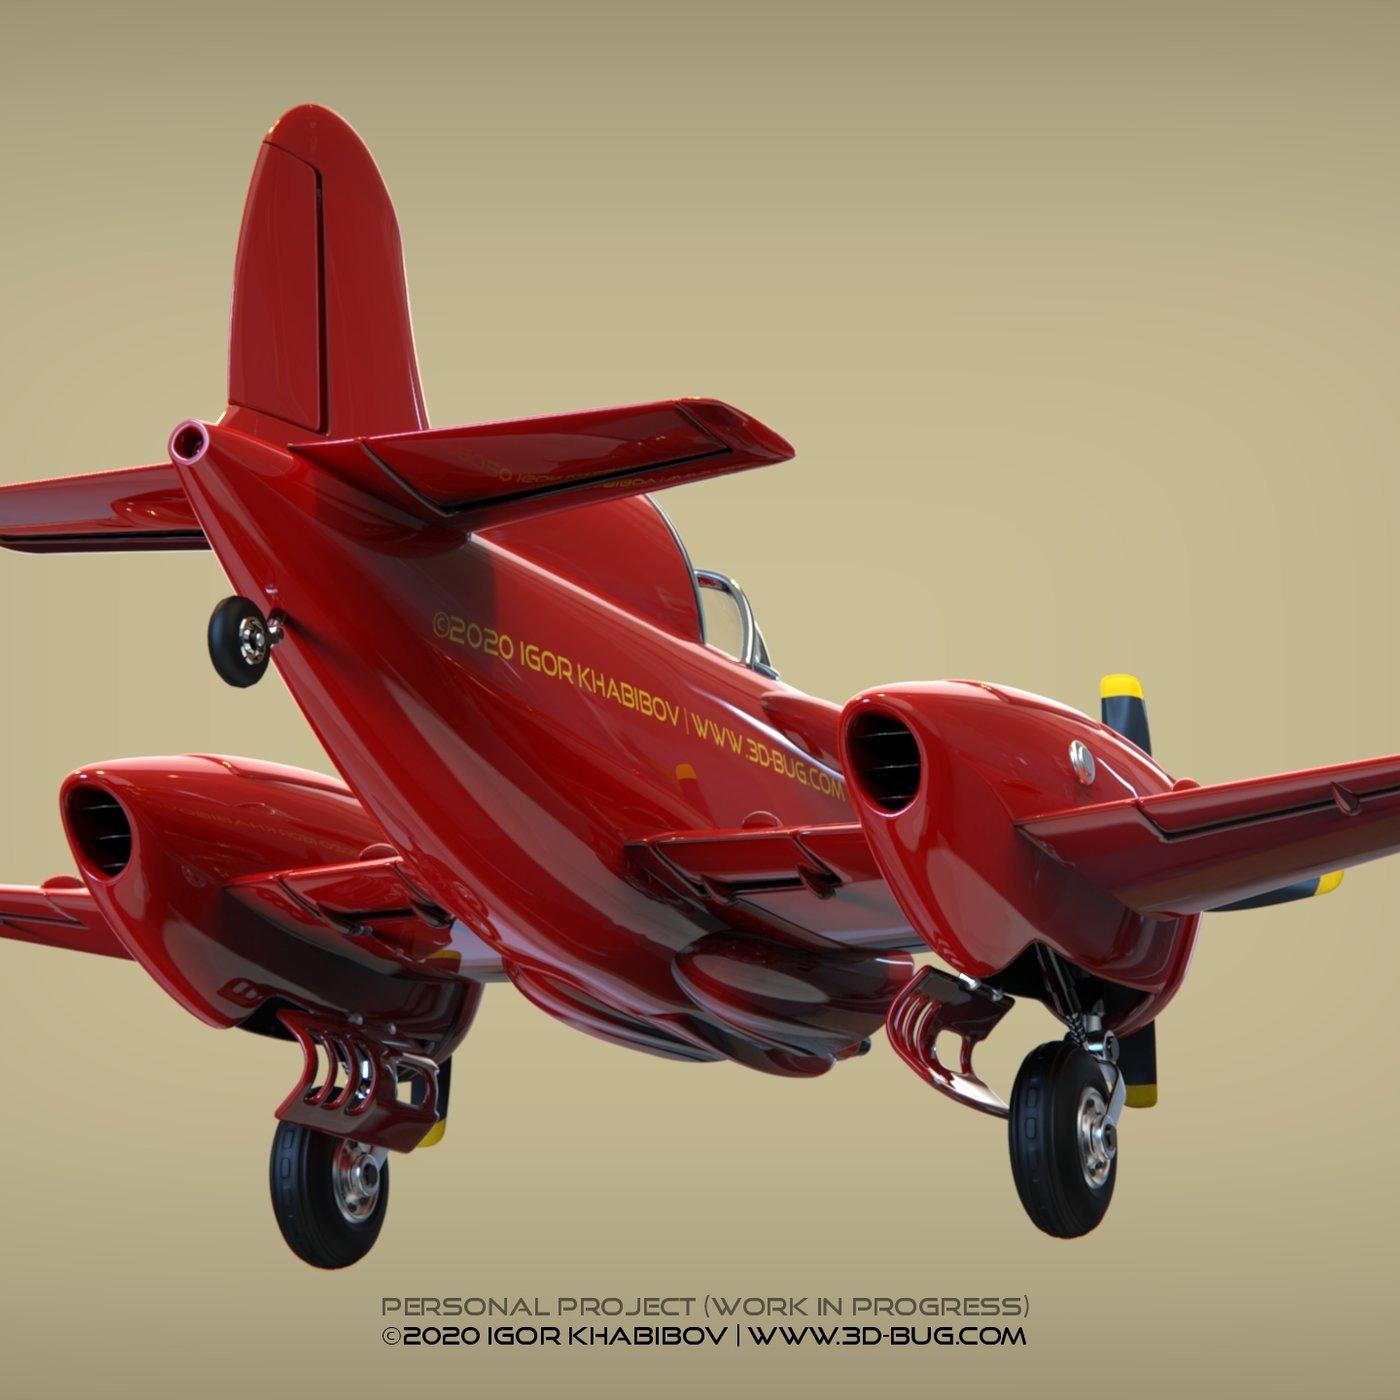 Fatty comic airplane